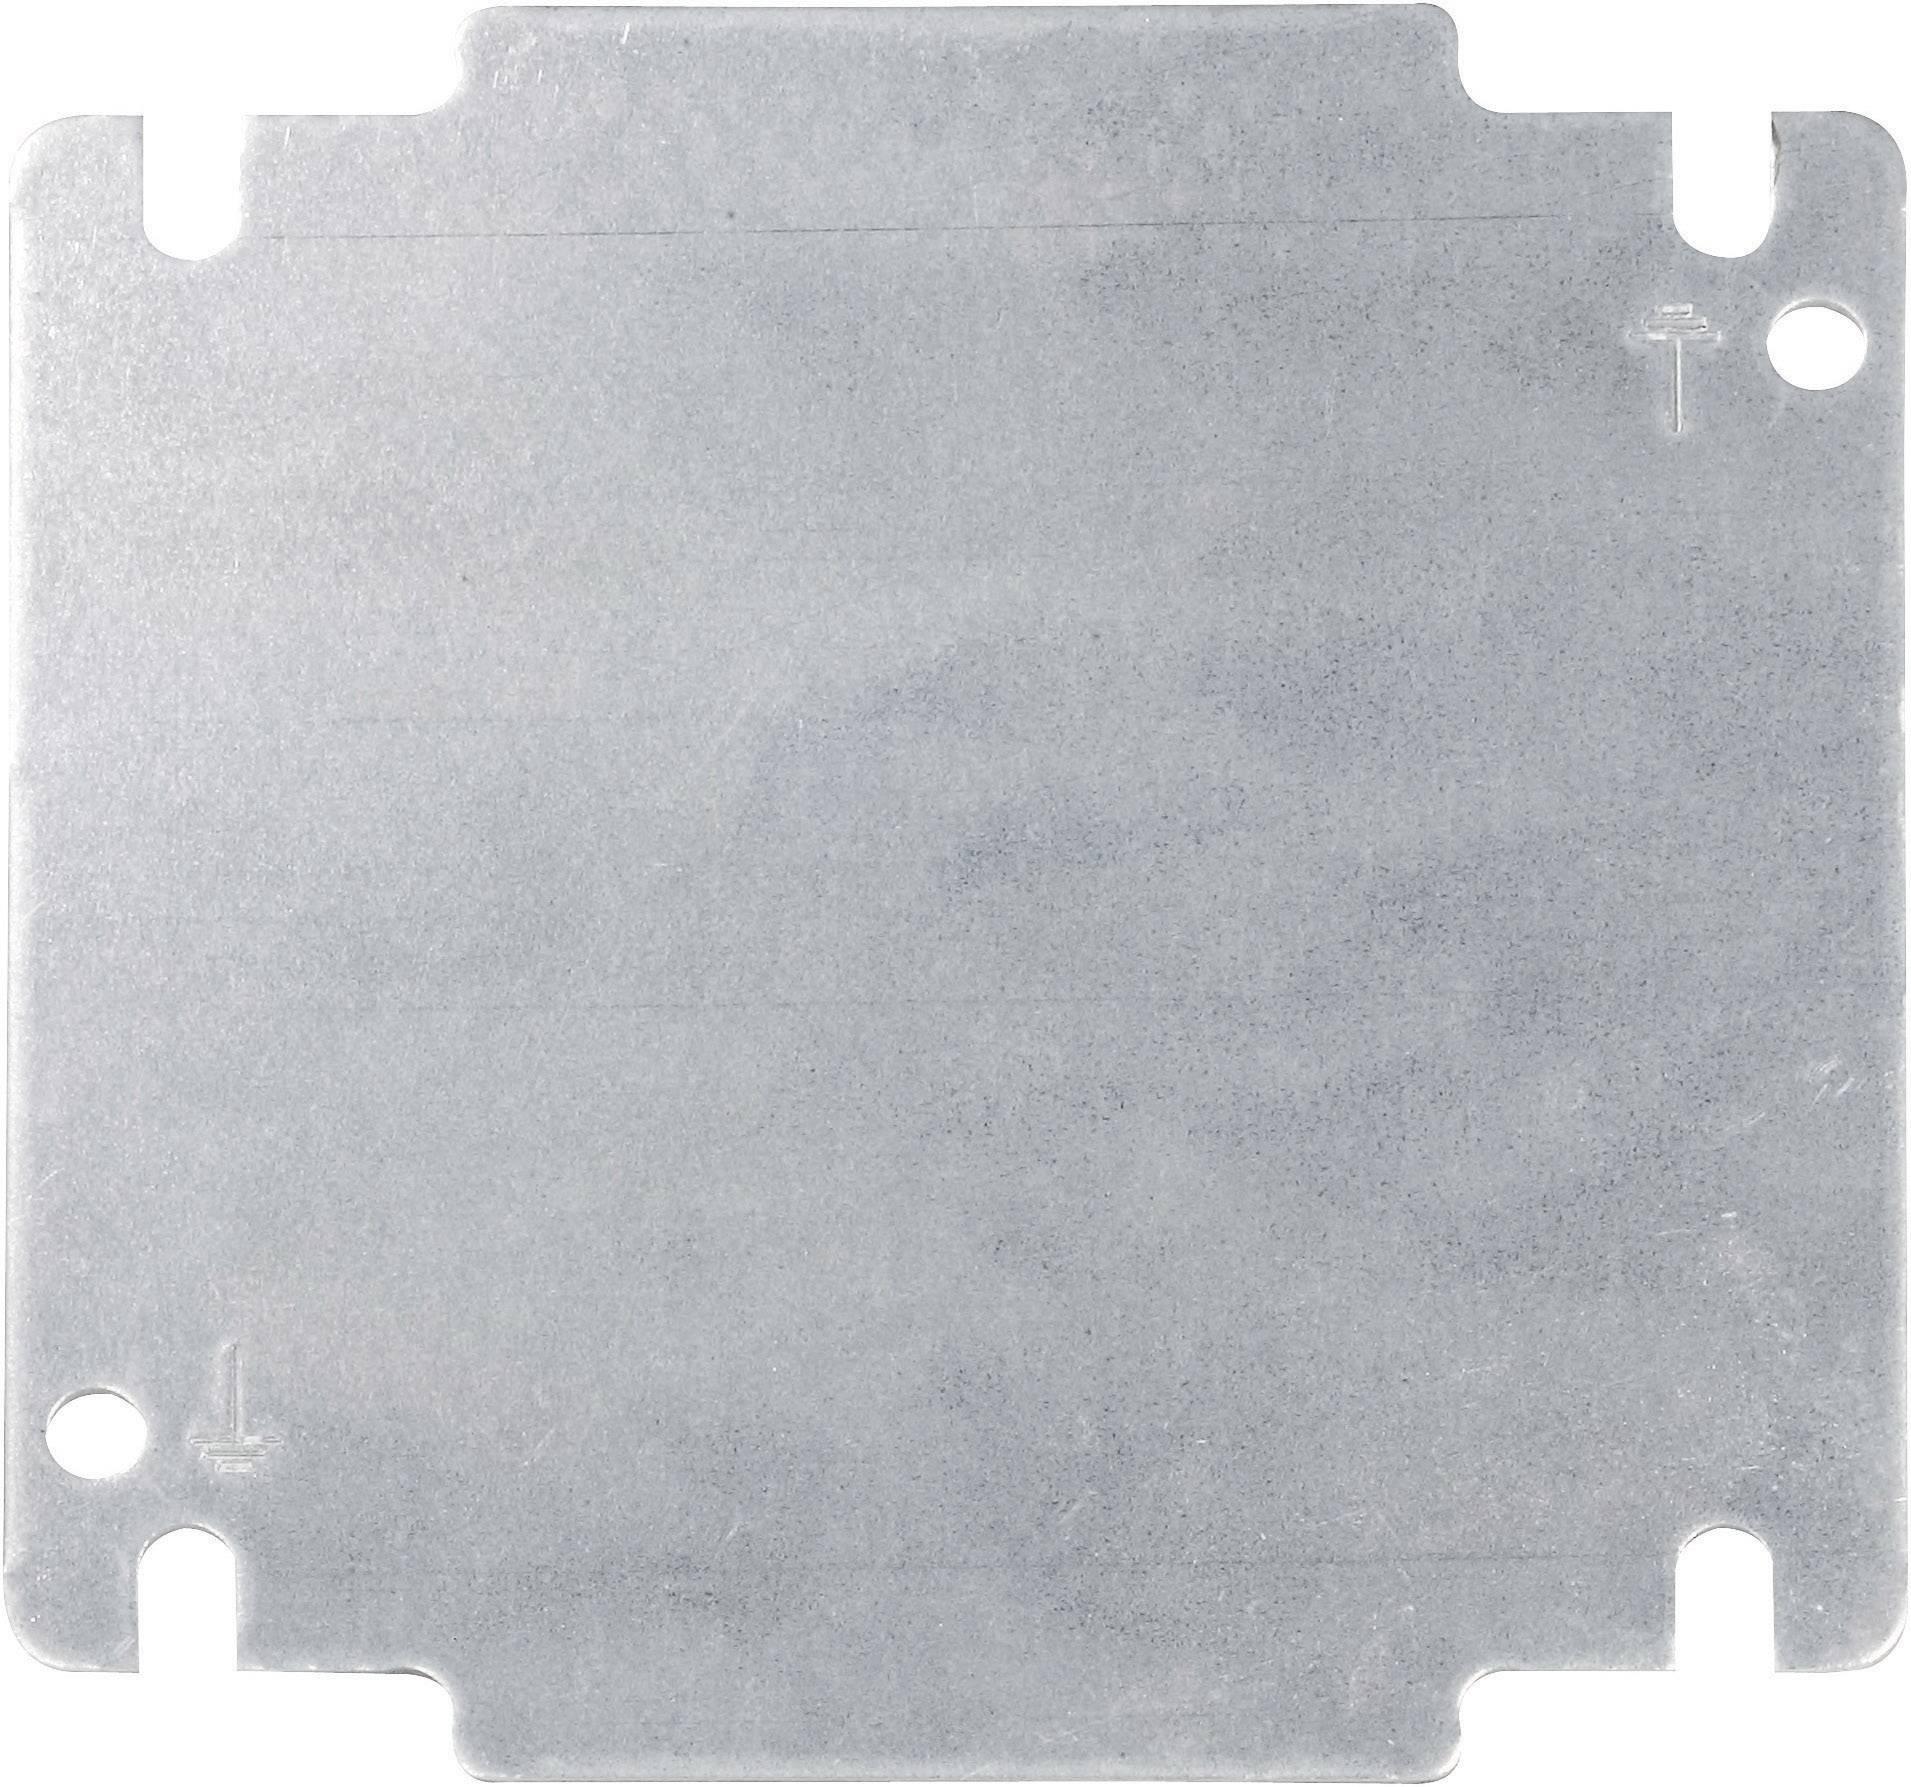 Montážna doska oceľový plech kov Schroff INLINE 32405-024, (d x š) 131 mm x 131 mm